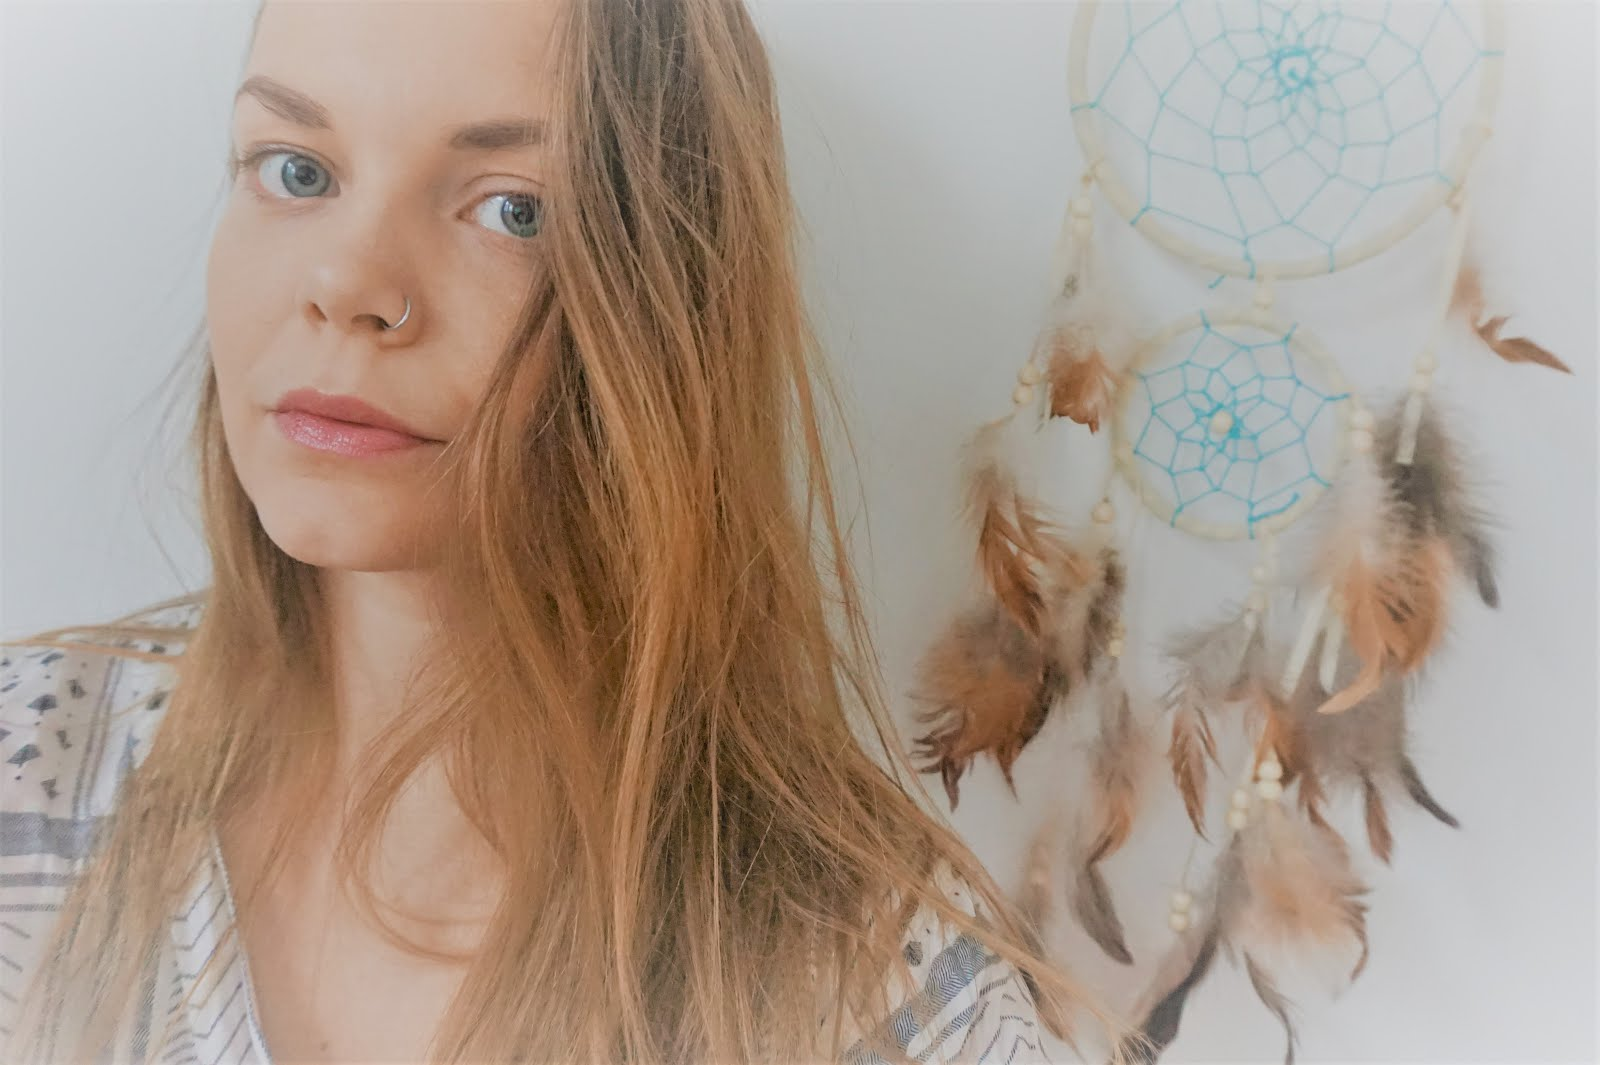 Susanna / 29 / Finland